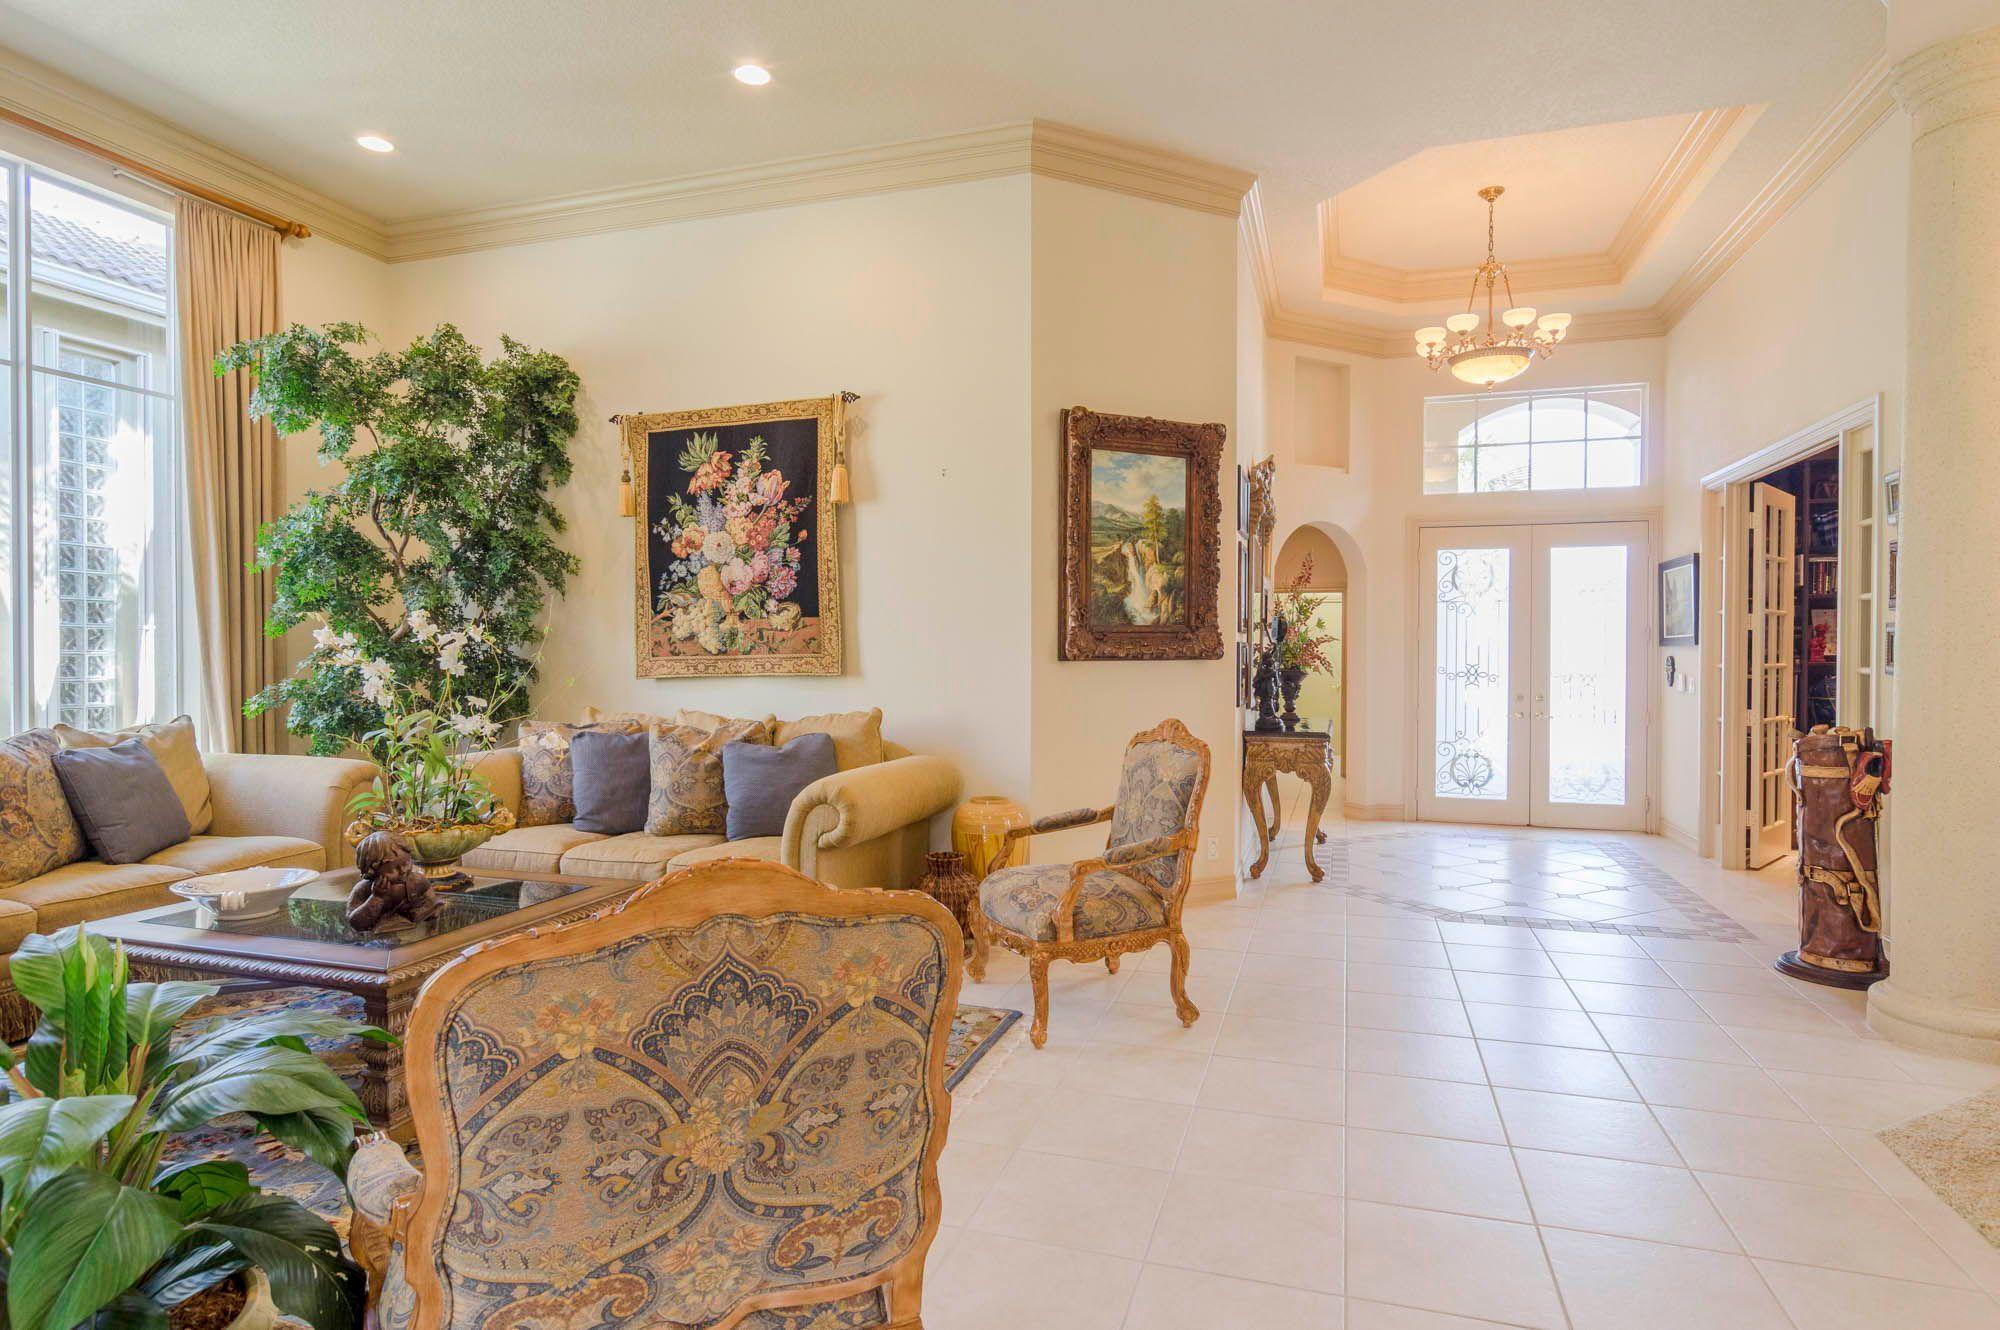 871d8de94dfbf250e1dde4dac70aa1ed - Rooms For Rent Palm Beach Gardens Fl